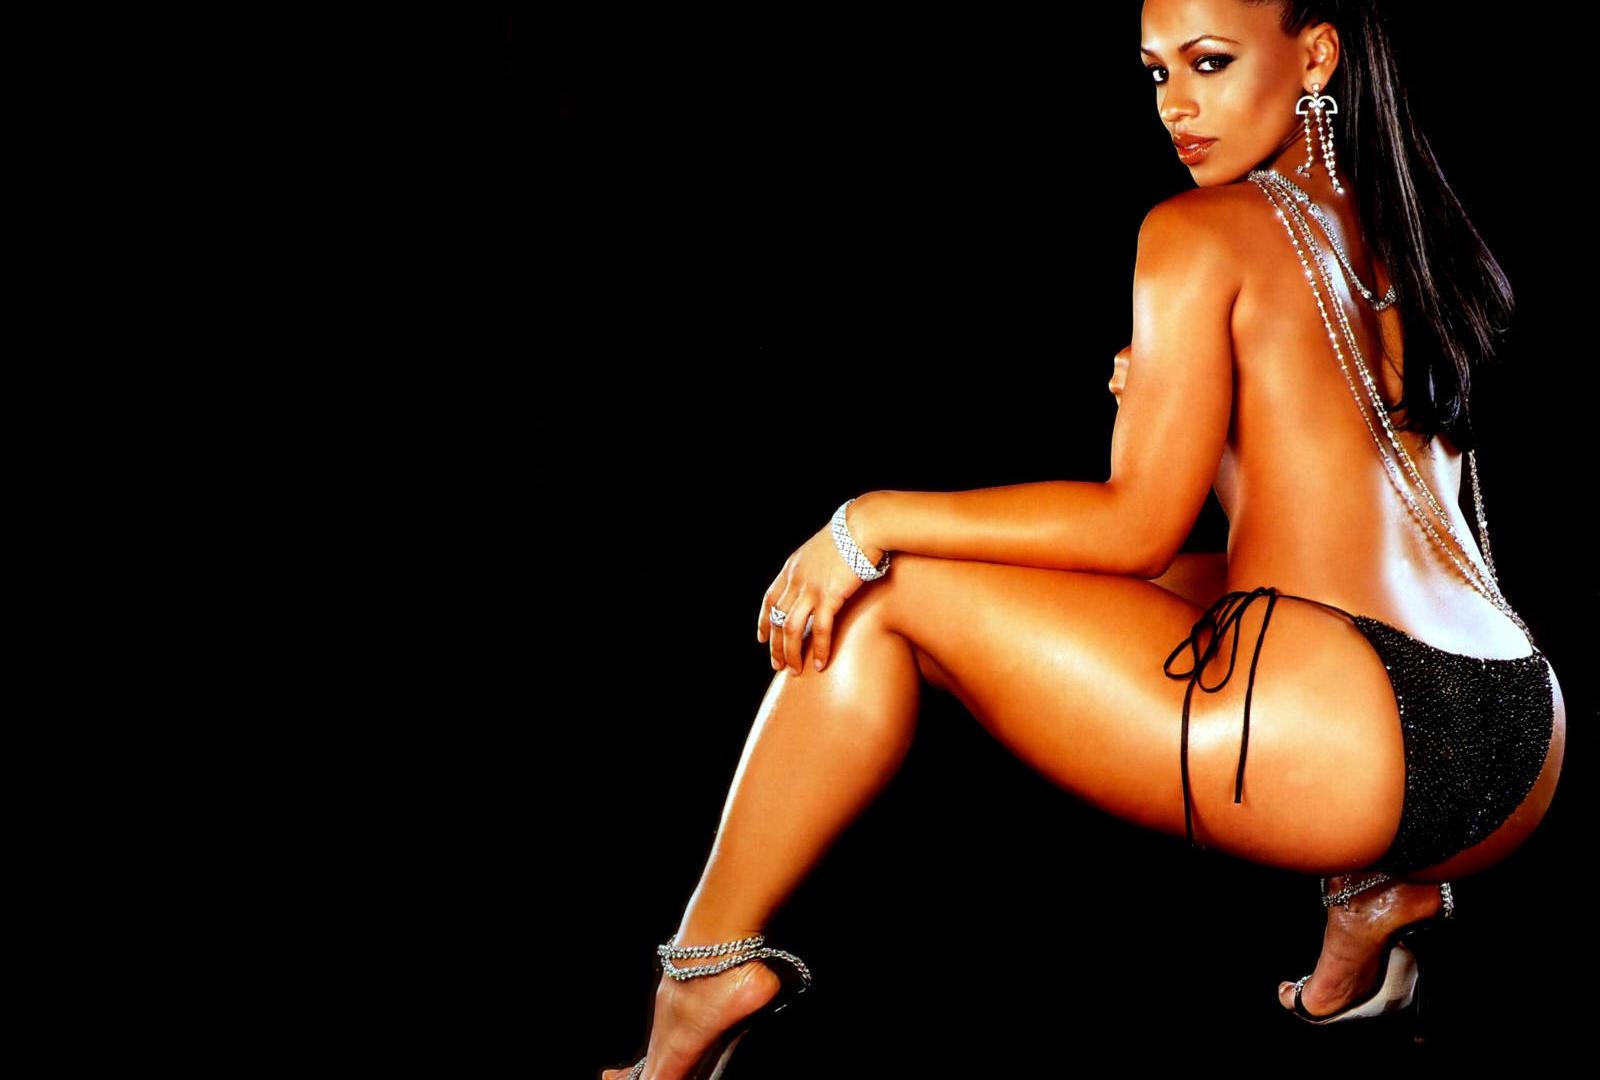 Download photo 1920x1080, brunette, ass, lingerie, black ...